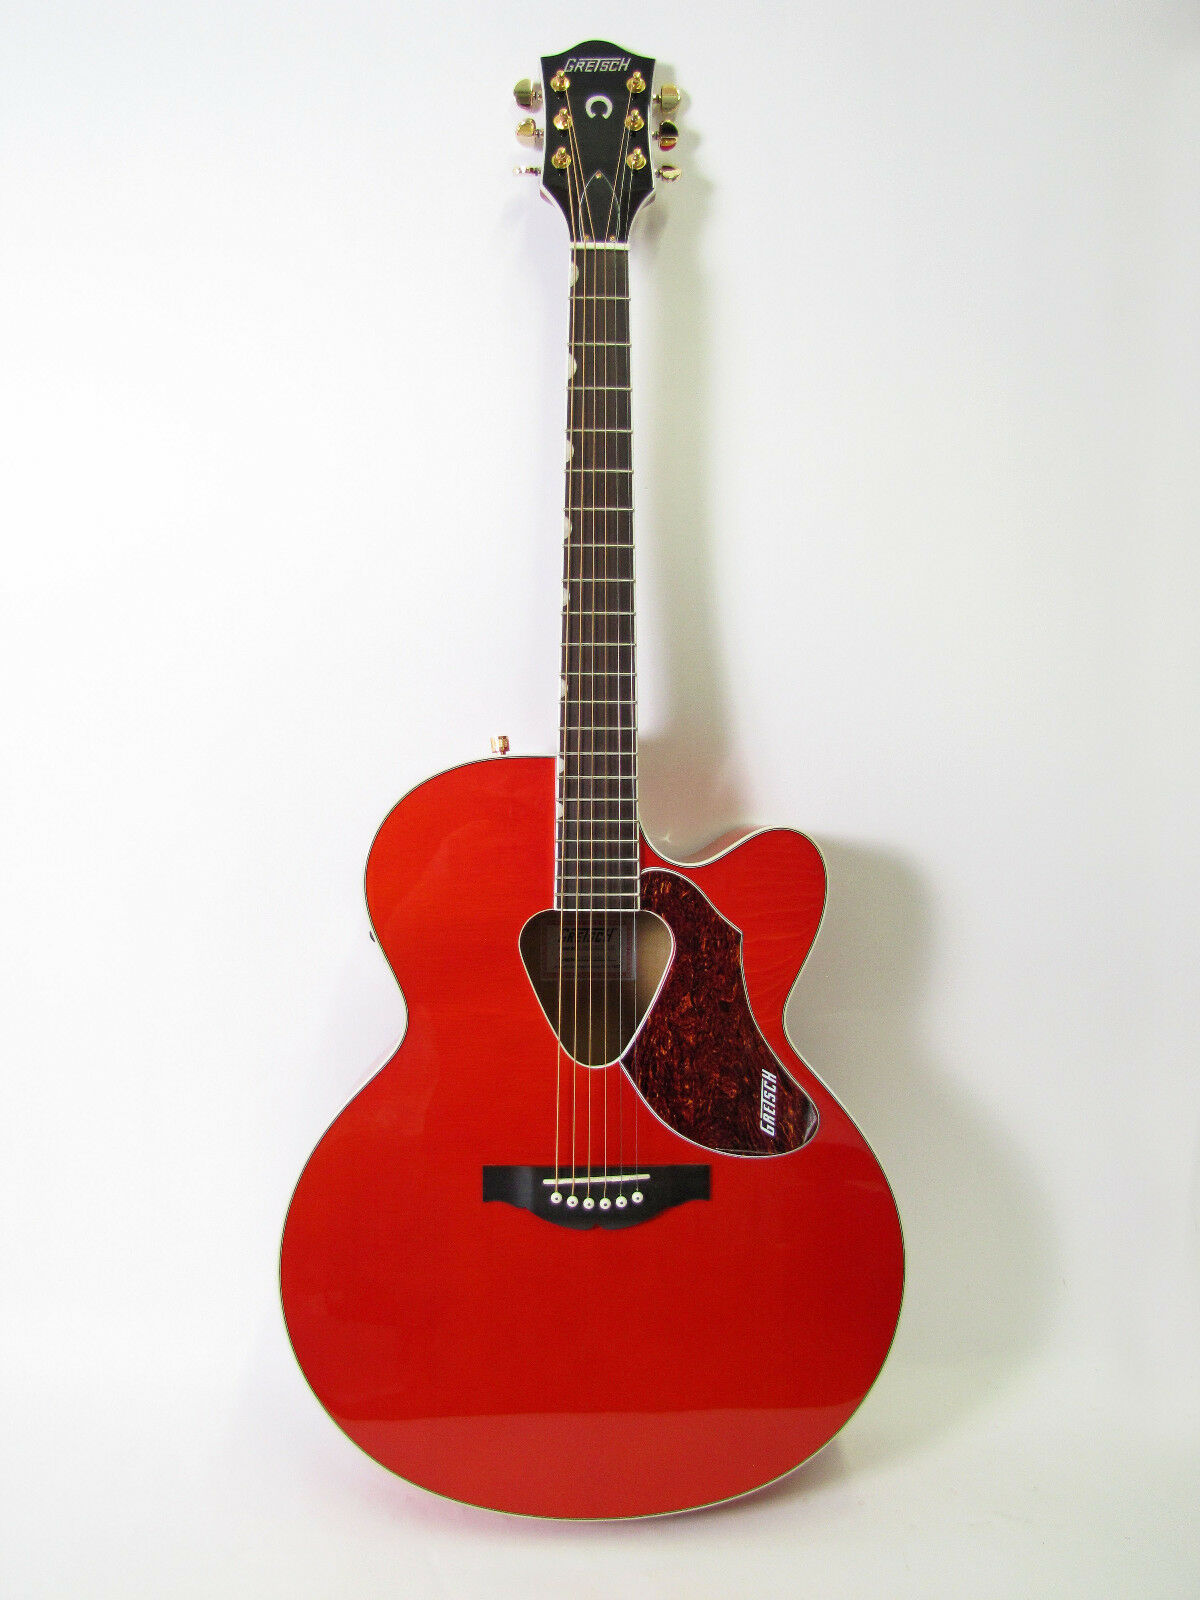 gretsch g5022ce jumbo rancher acoustic electric orange guitar fishman pickup new ebay. Black Bedroom Furniture Sets. Home Design Ideas